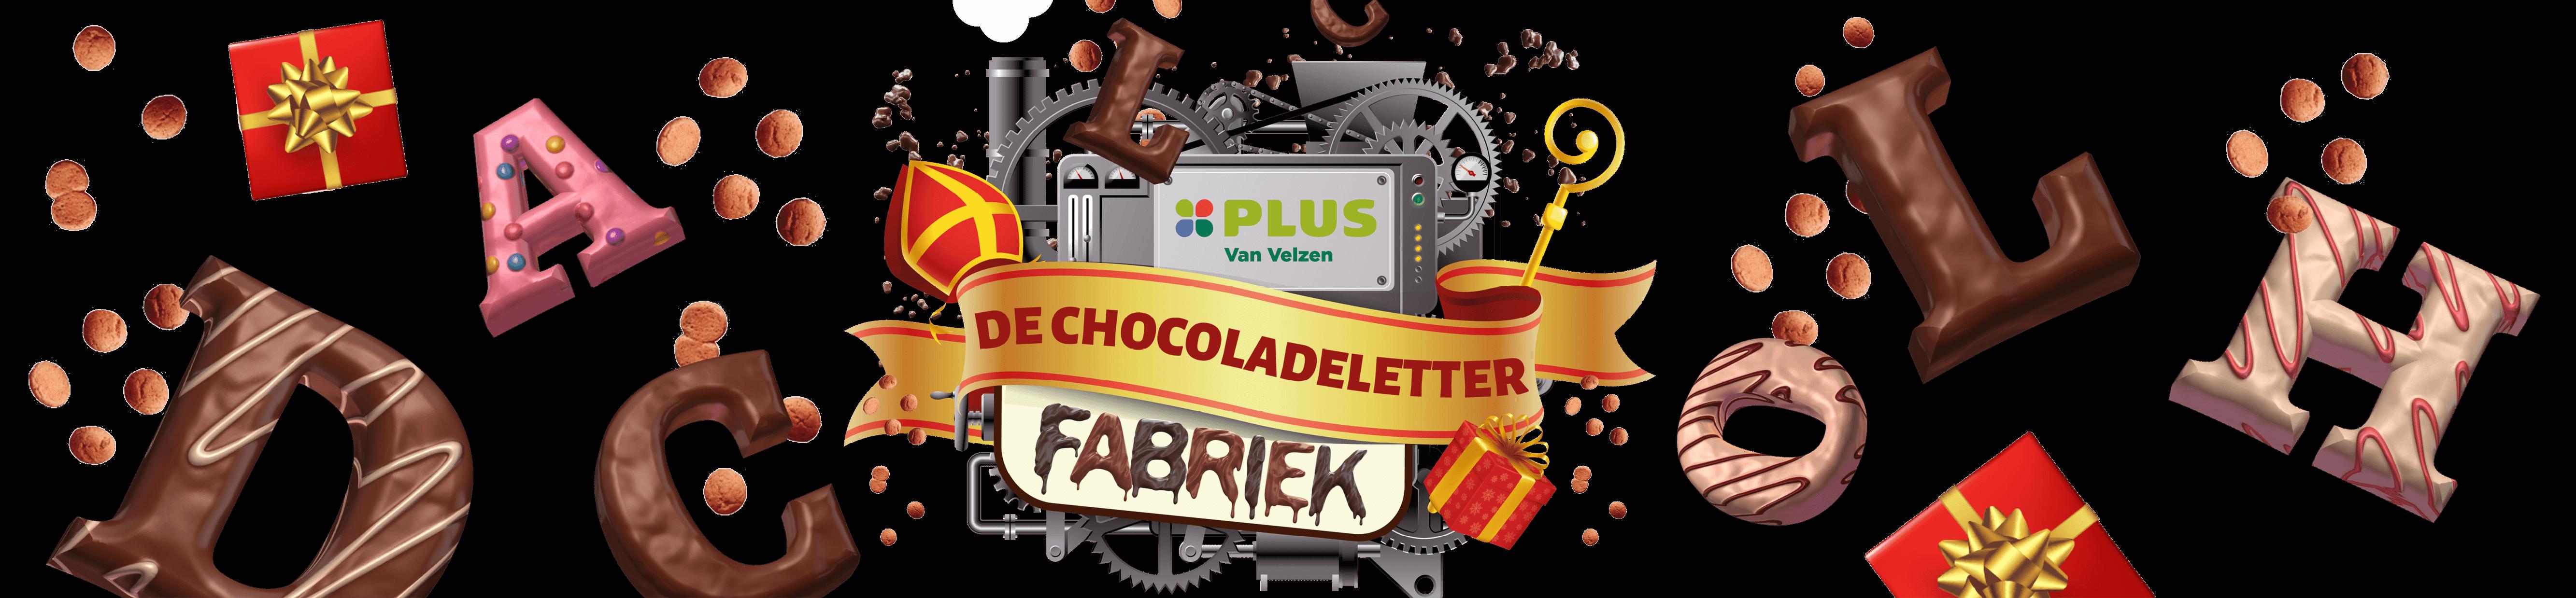 De Chocoladeletter Fabriek